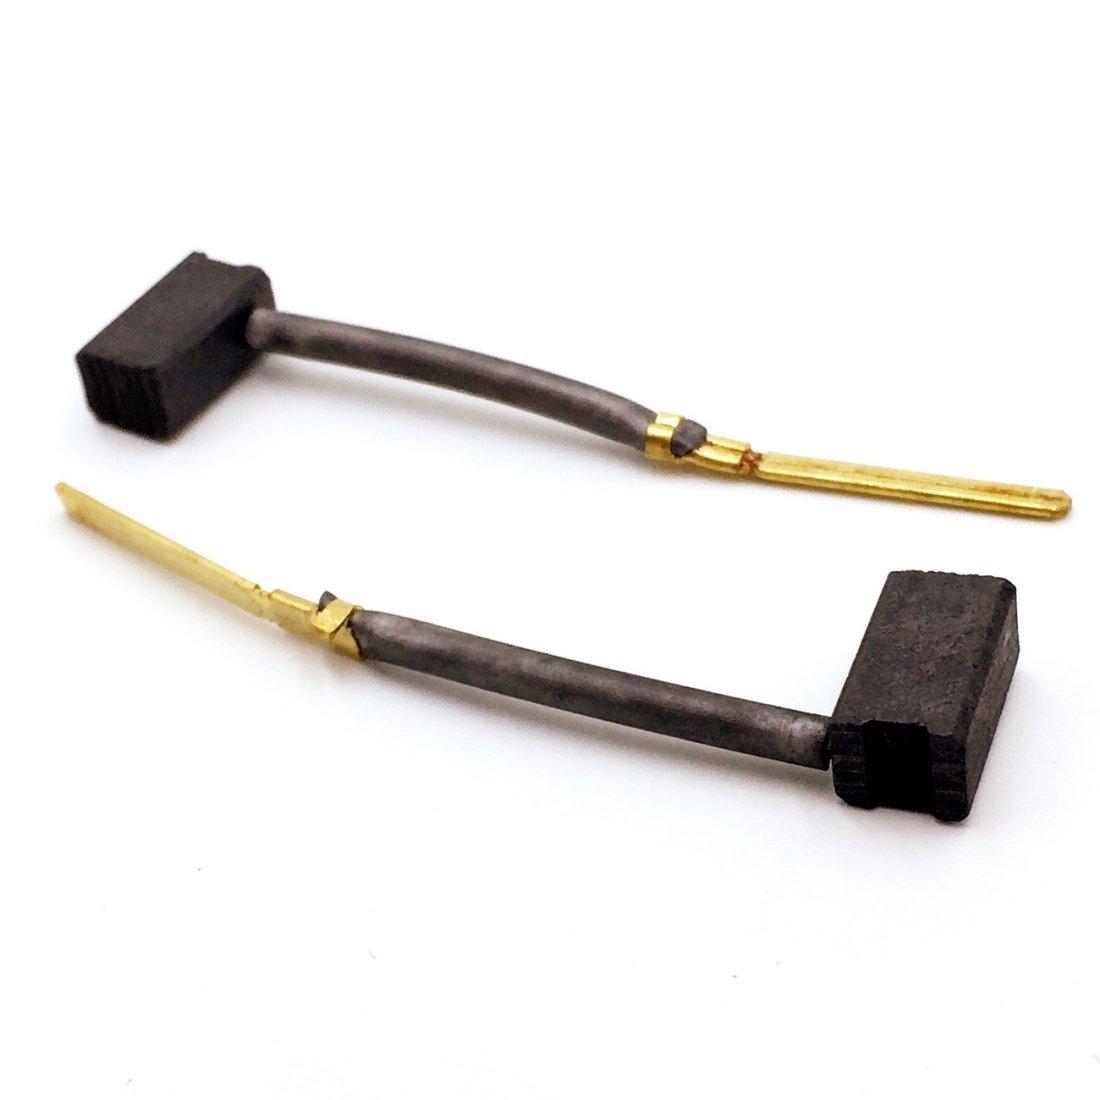 Replacement Part 445861-25 Carbon Brushes (1 pair) for DeWalt/Black & Decker Power Tools, Porter Cable, Drill,Jig Saw,Gauge Shear,Plate Joint,Sander,Grinder,Gauge Nibbler,Polisher zchoicestore